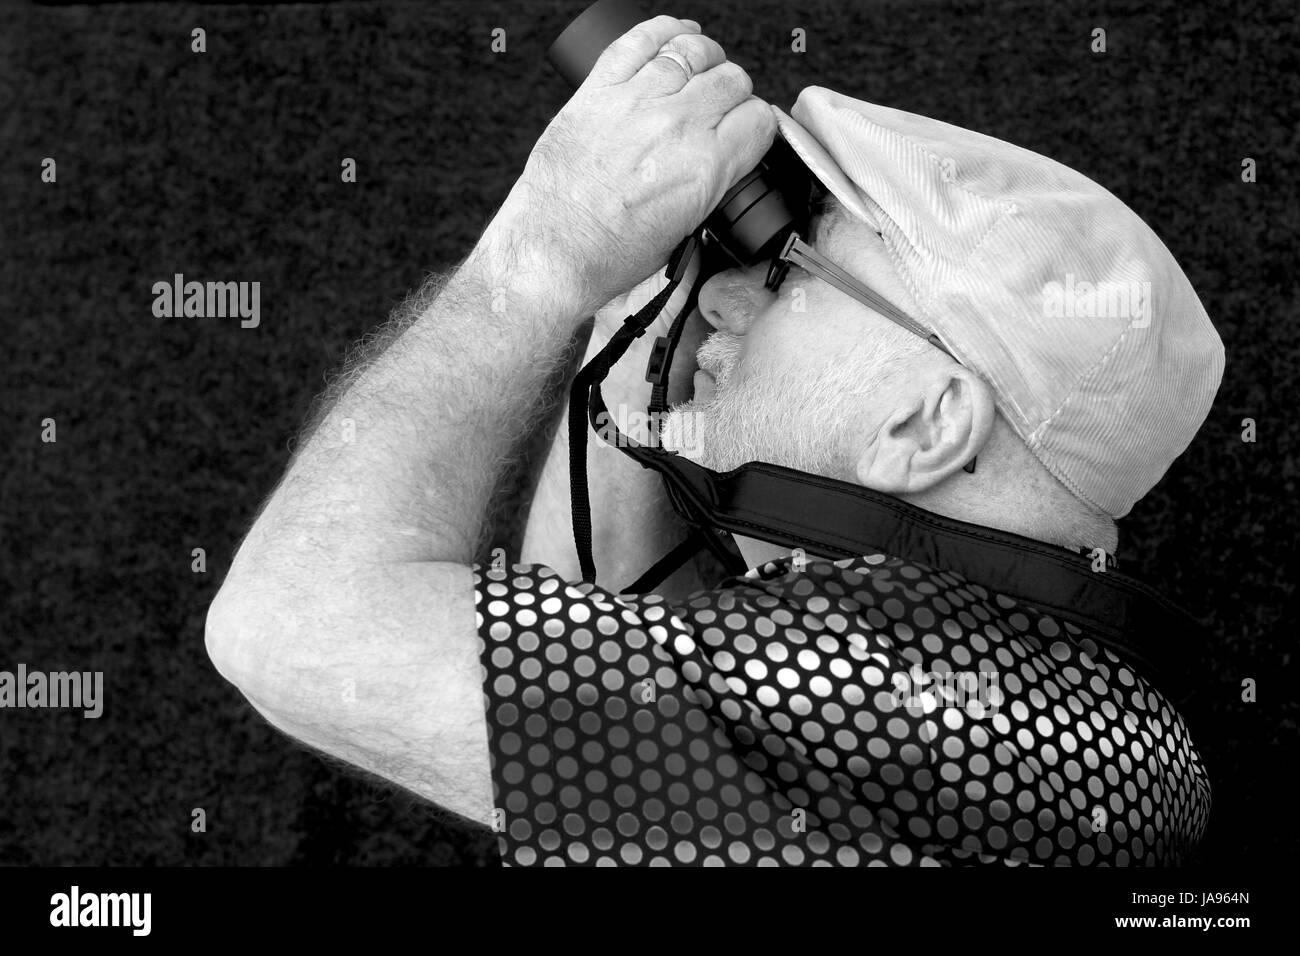 Old man with binoculars. - Stock Image